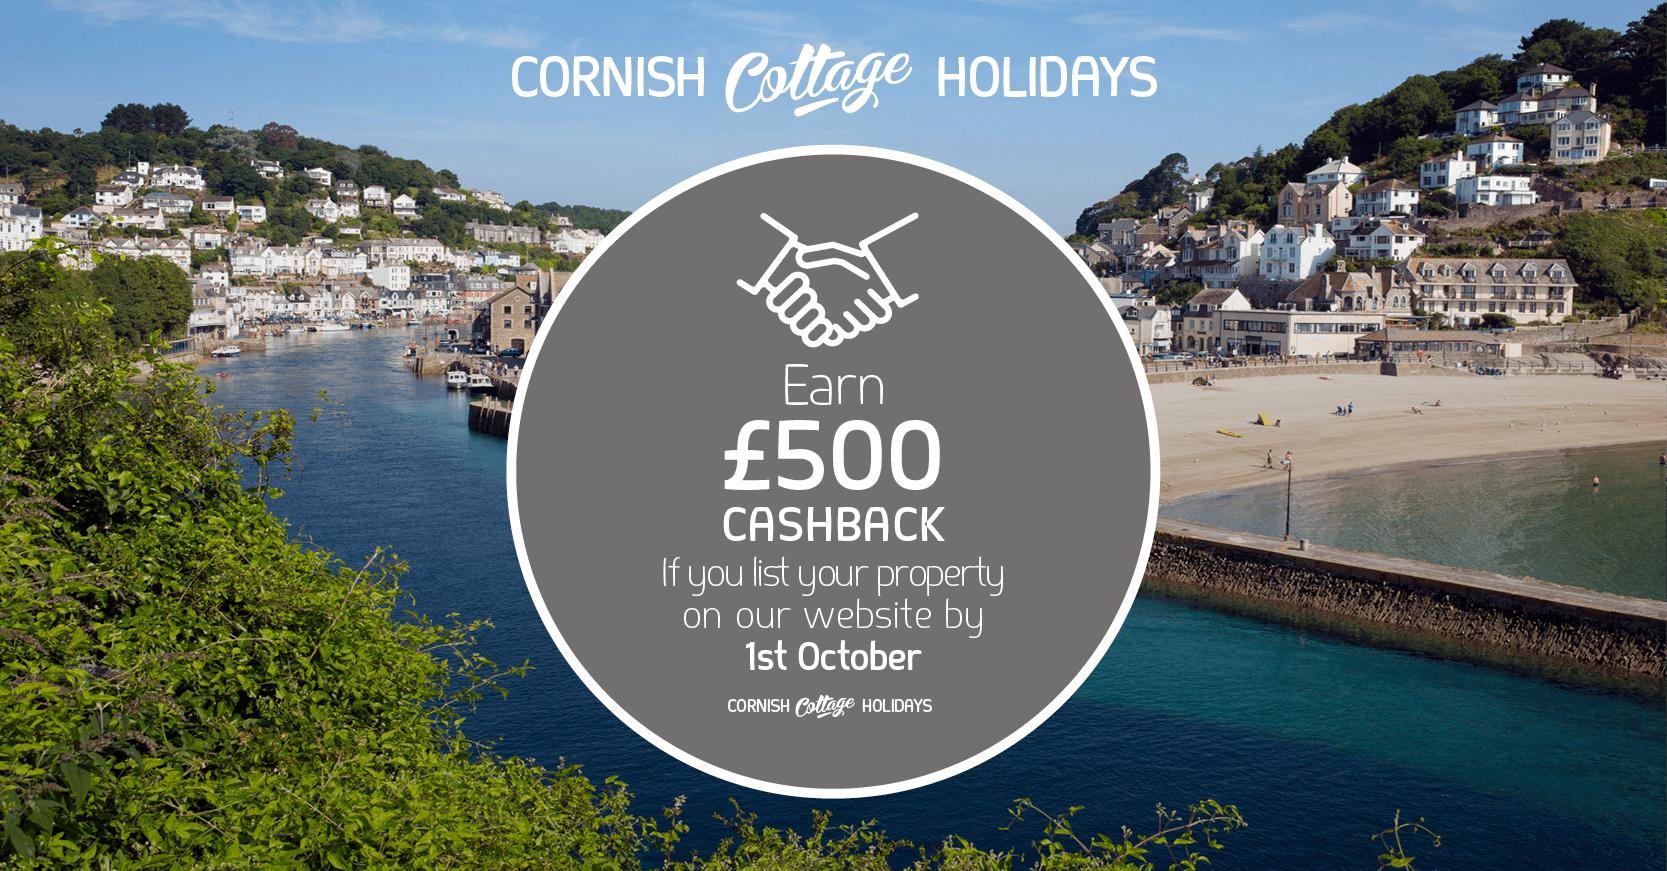 Cornish Cottage Holidays property owners £500 cashback offer